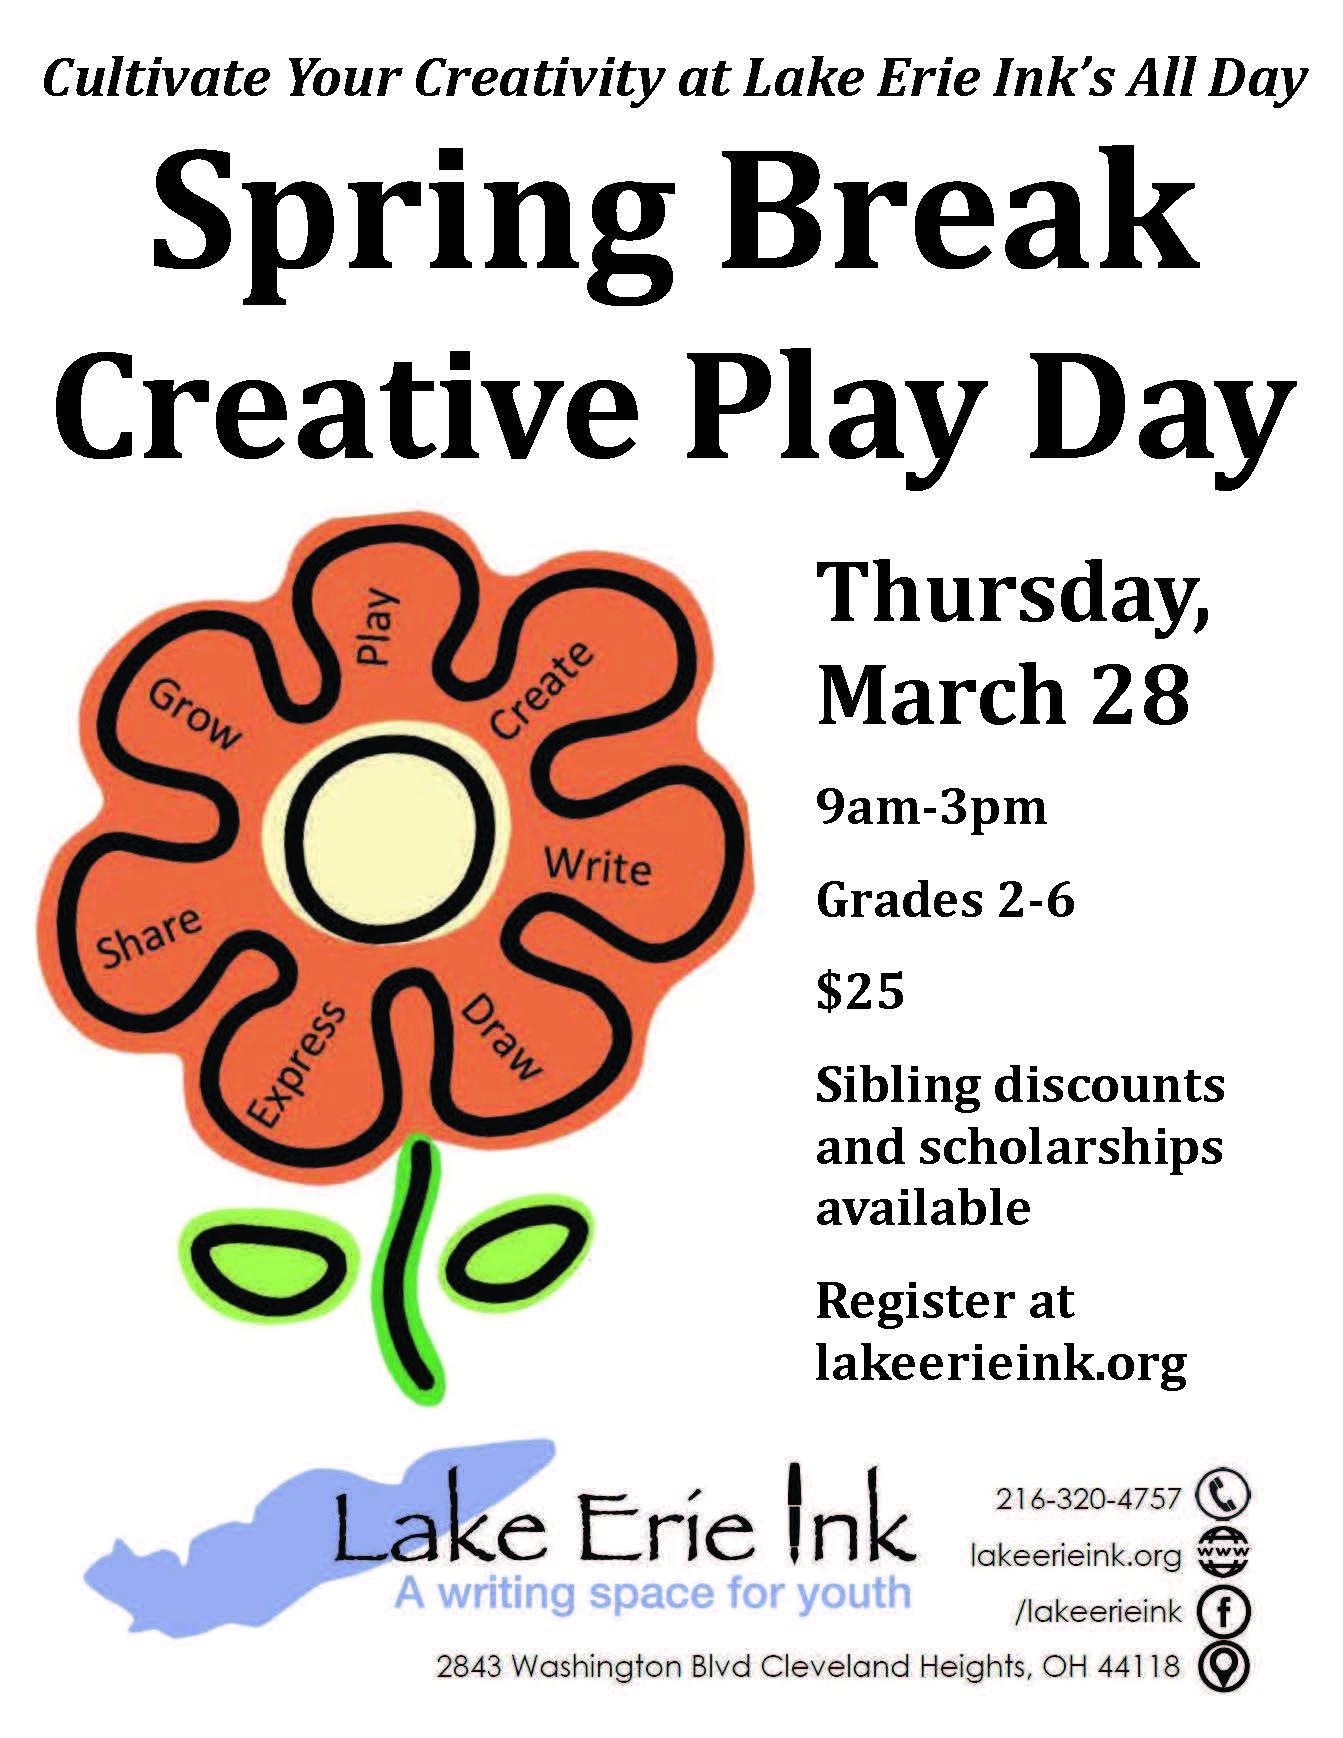 spring break creative play day flyer